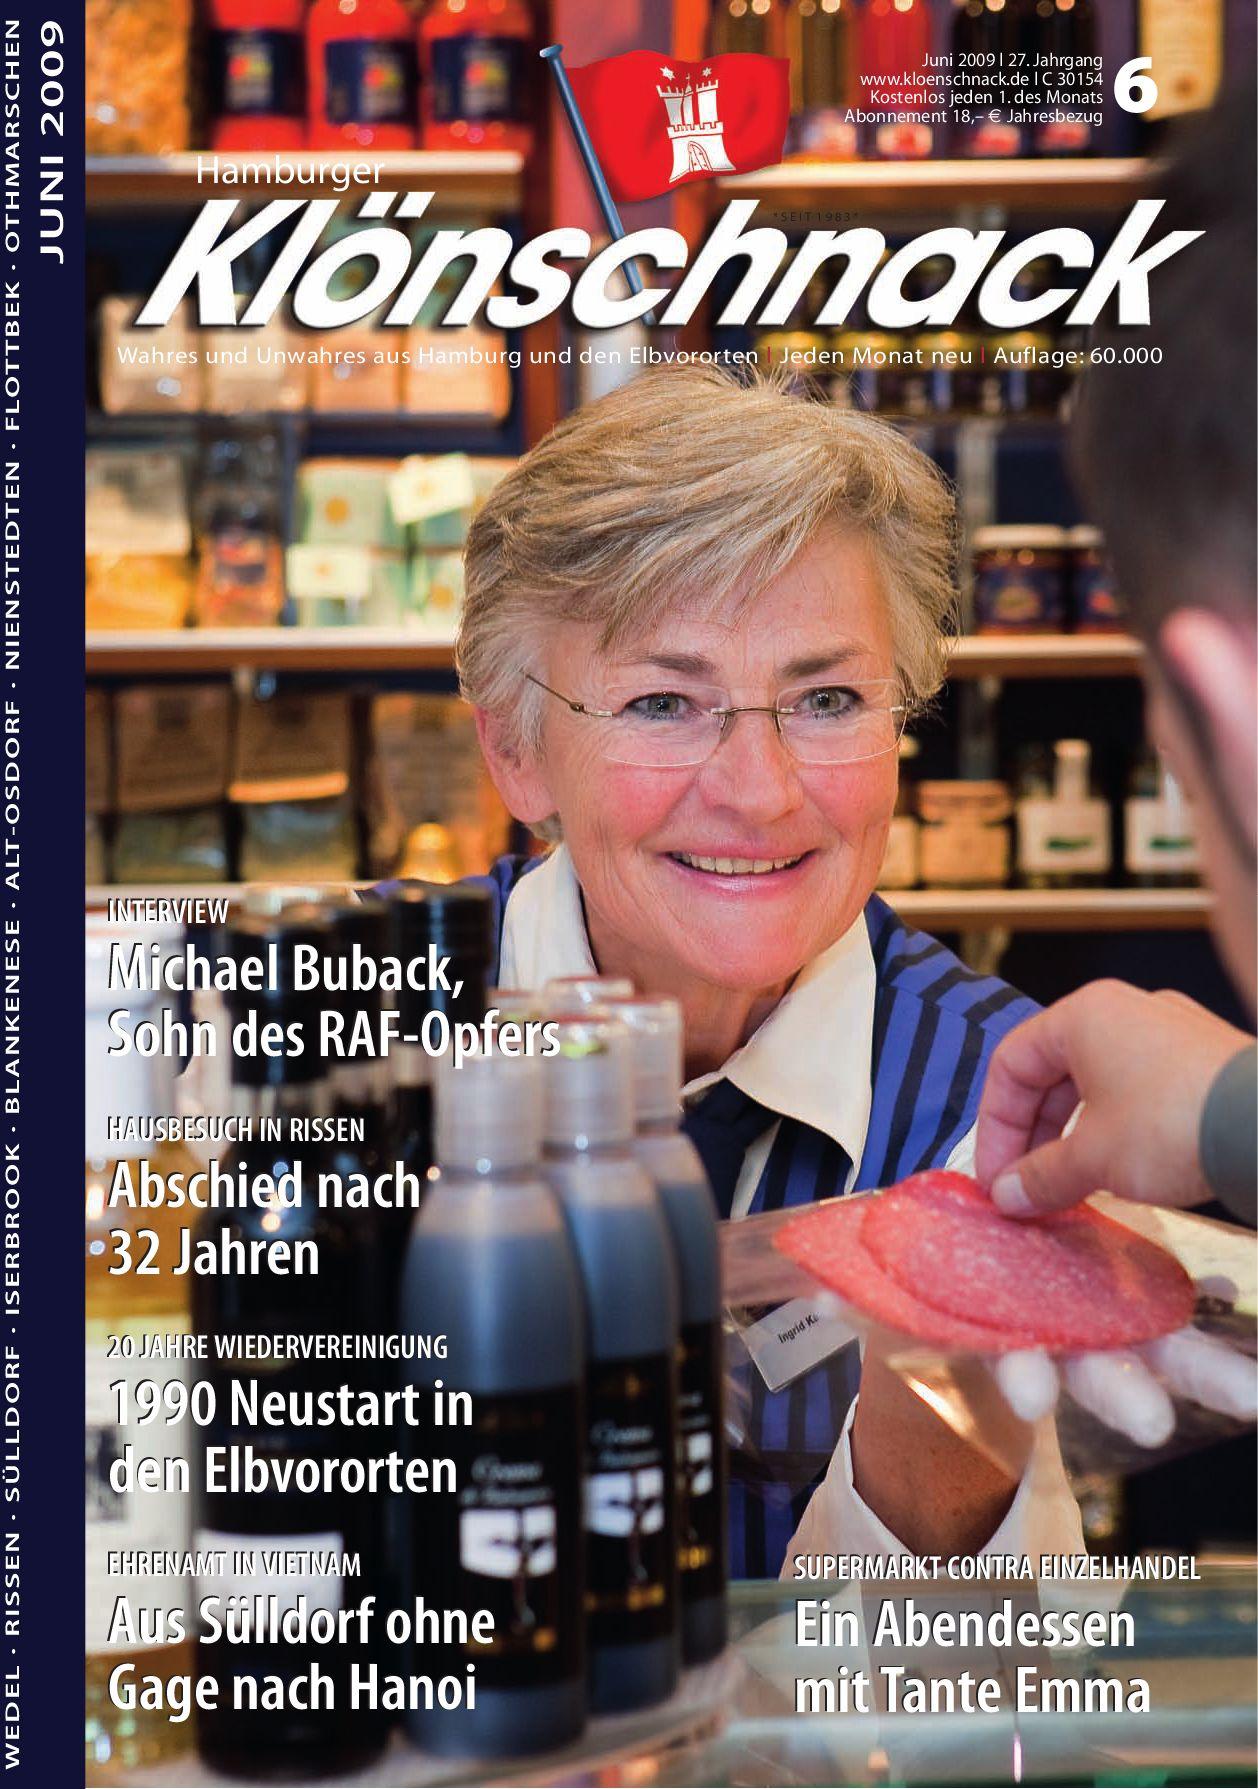 Hamburger kl nschnack juni 39 09 by hamburger kl nschnack issuu - Bureau veritas interview ...